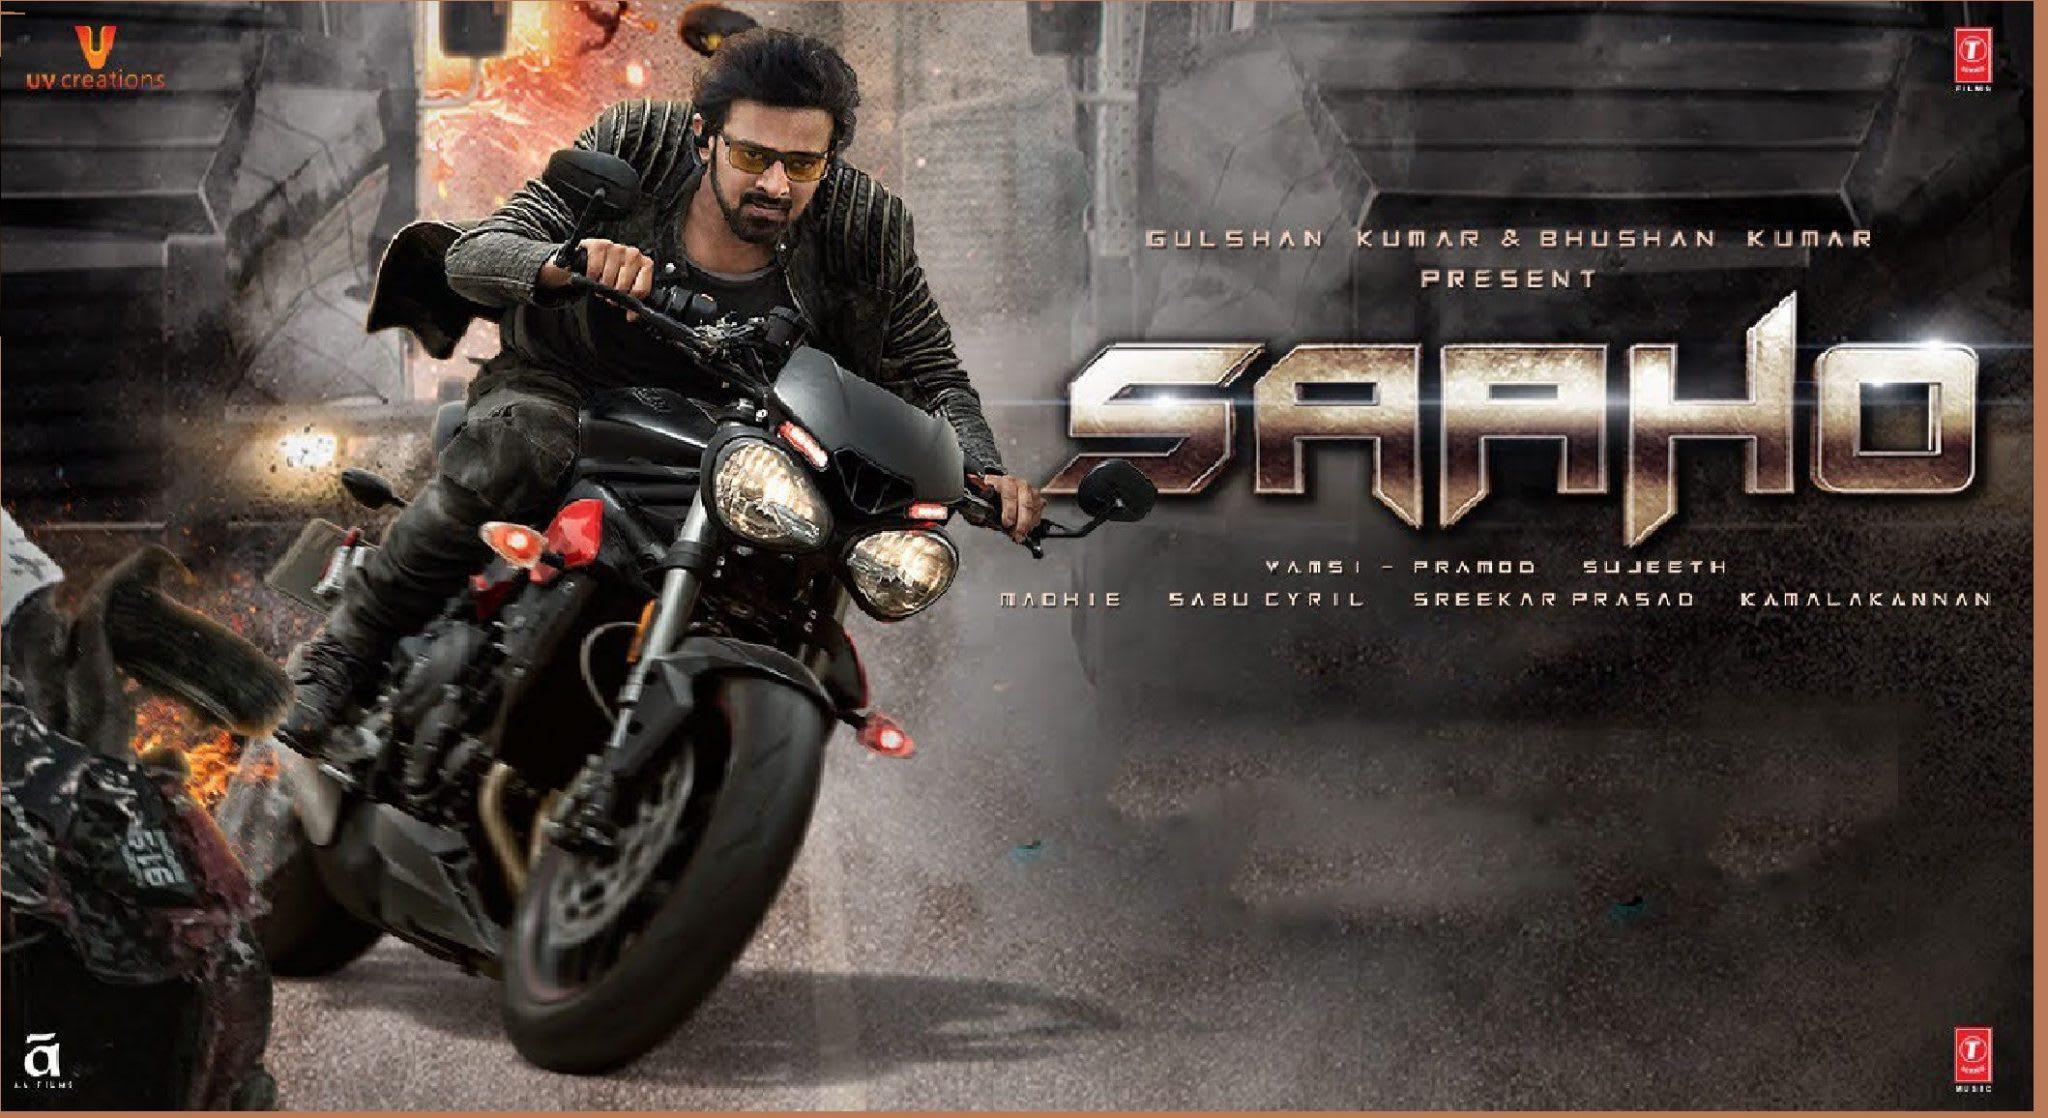 Saaho Full Movie Download in HD 720p 1080p mkv- tamilrockers,filmyzila,filmyhit